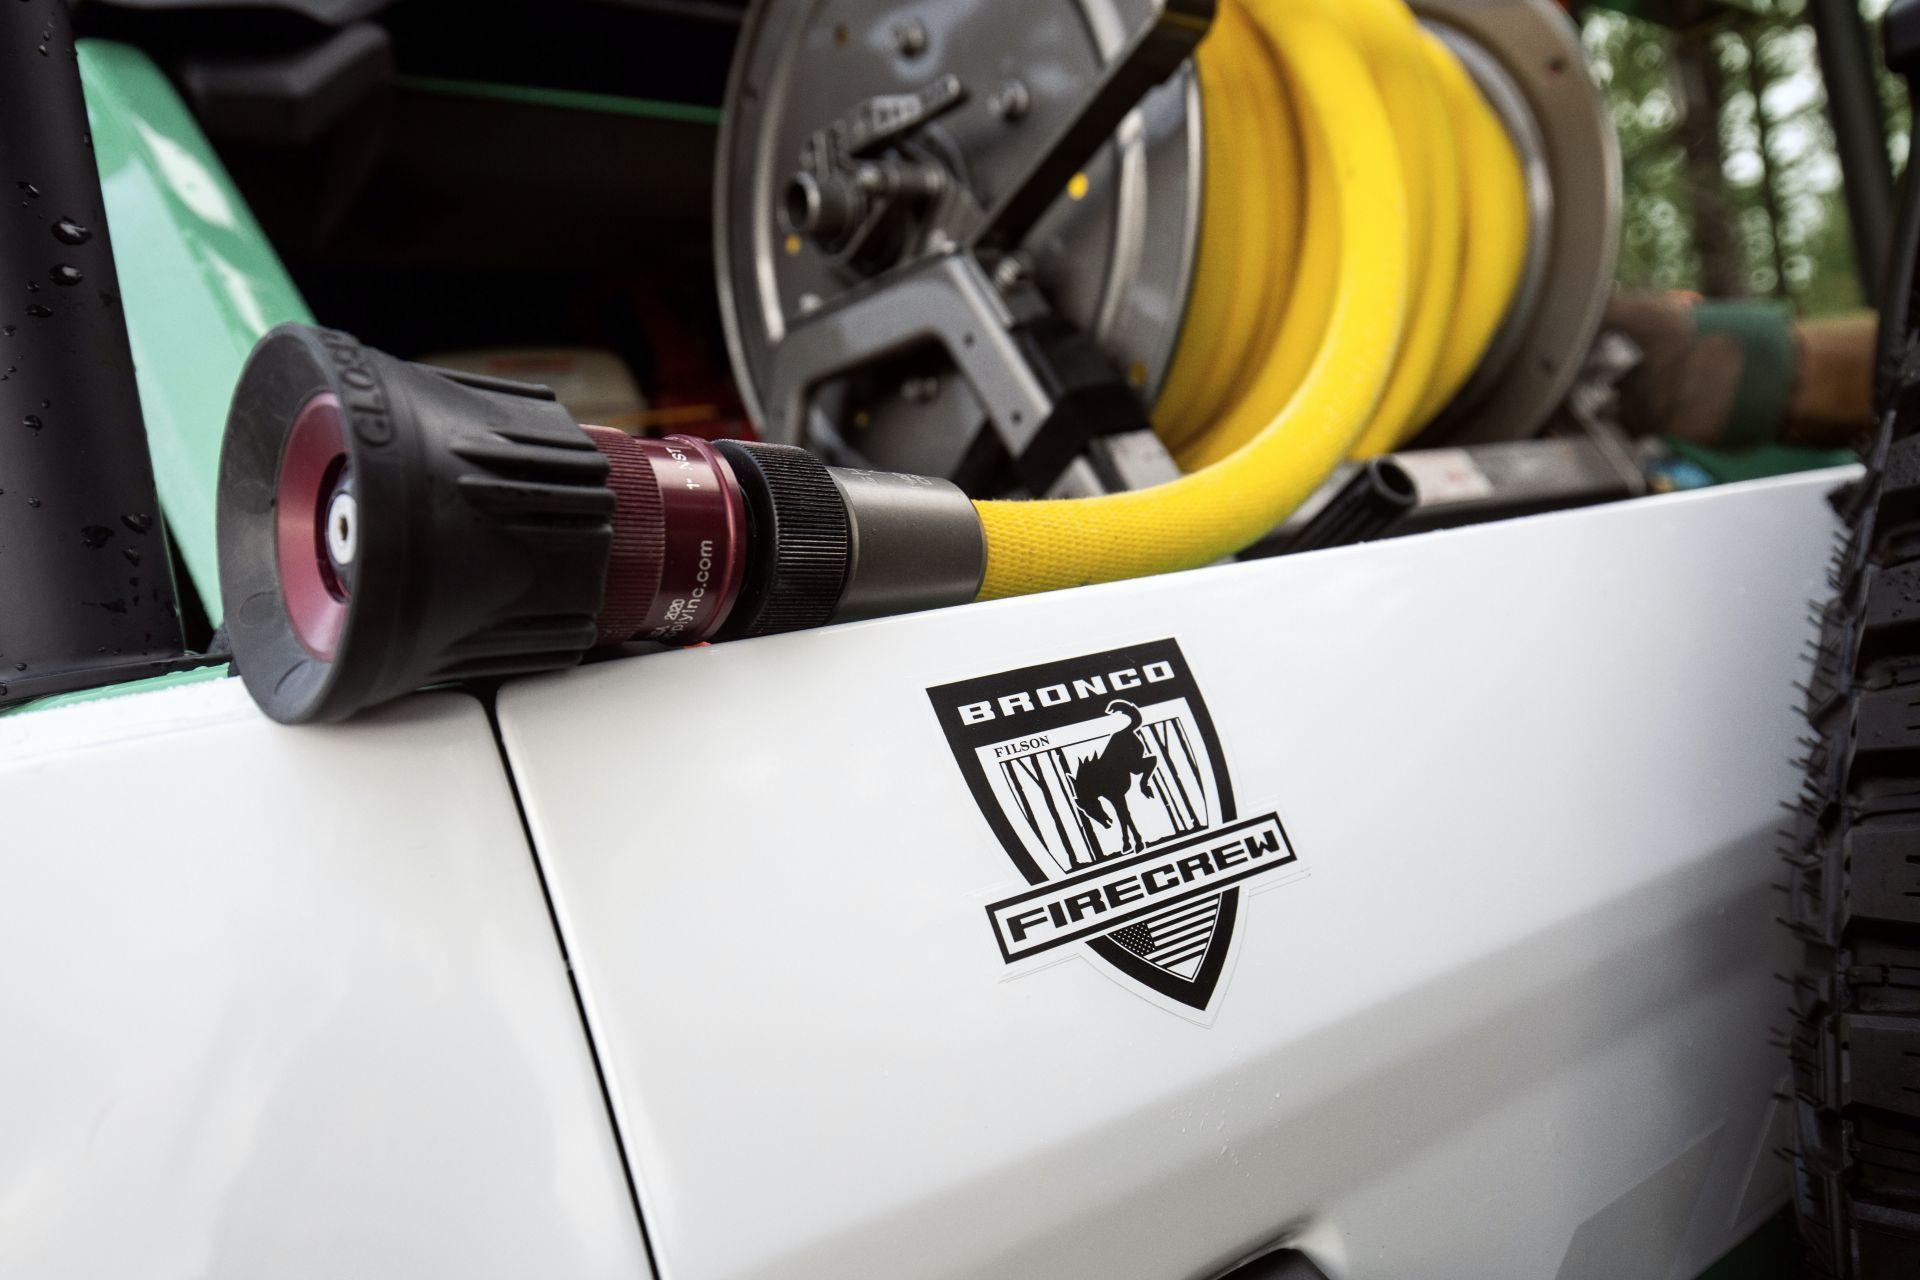 Ford-Bronco-Wildland-Fire-Rig-Concept-10